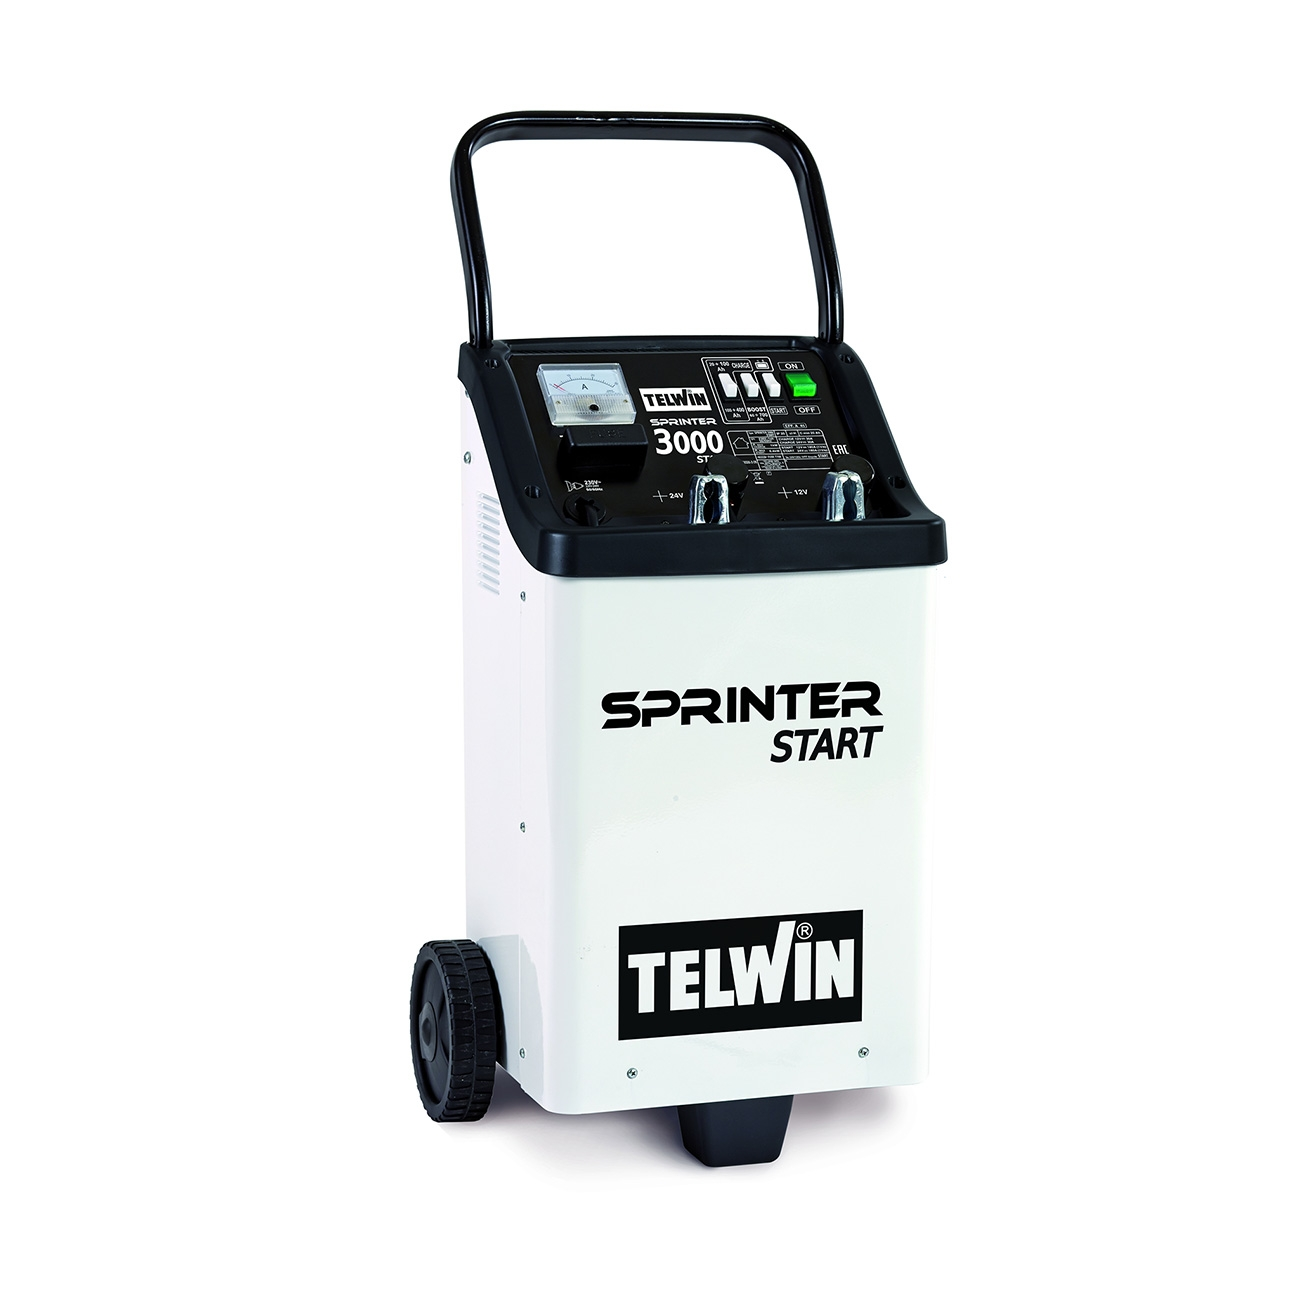 Image of Caricabatterie e avviatore Telwin Sprinter 3000 Start